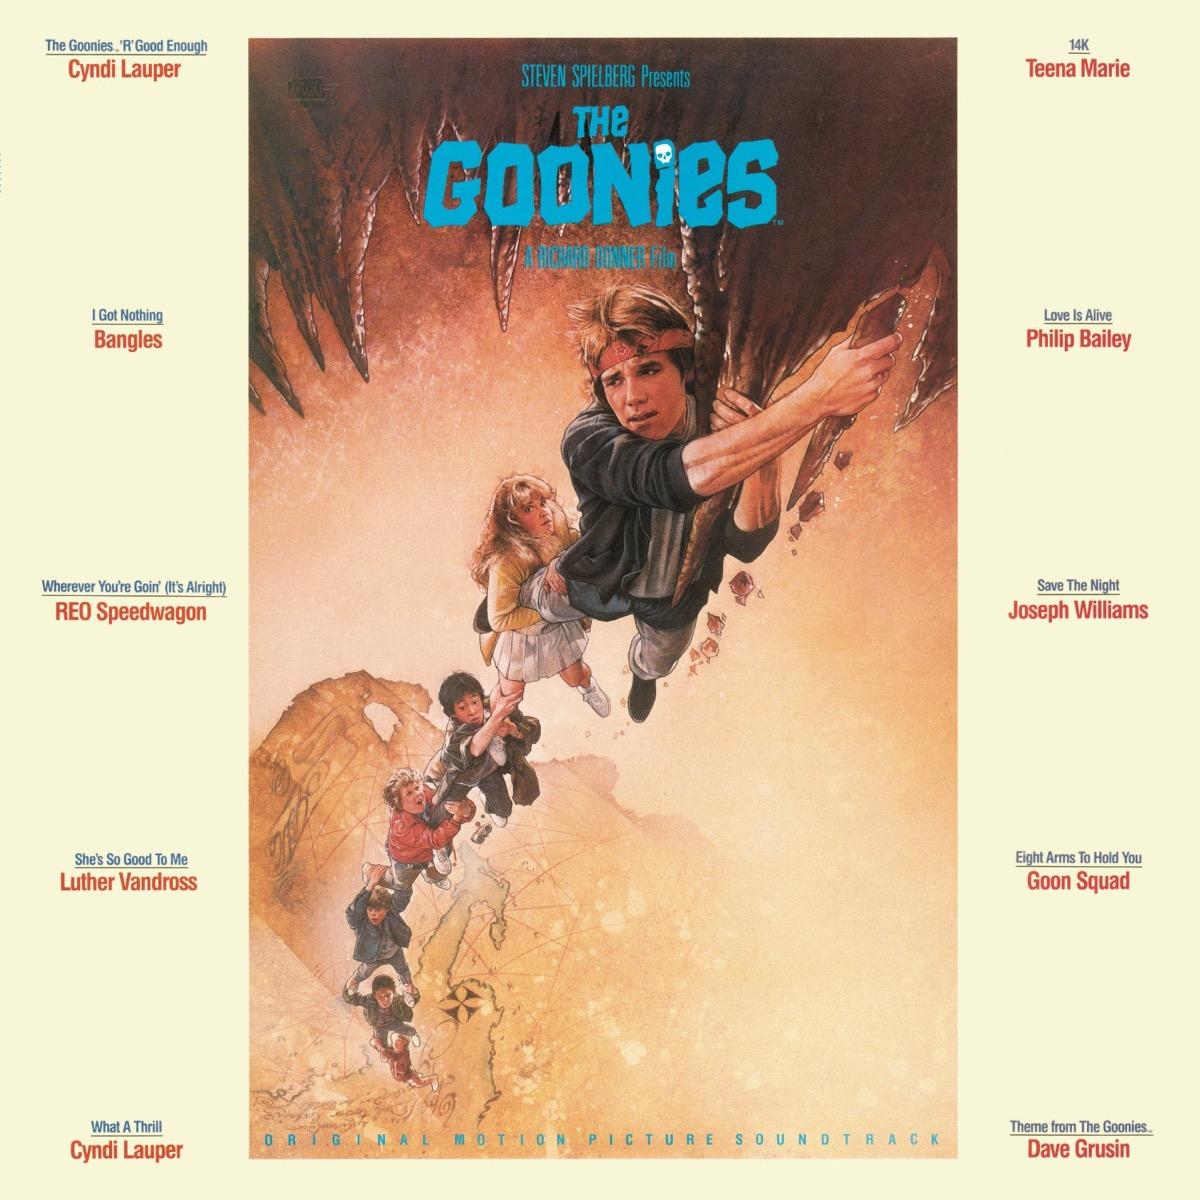 the goonies movie soundtrack album cover